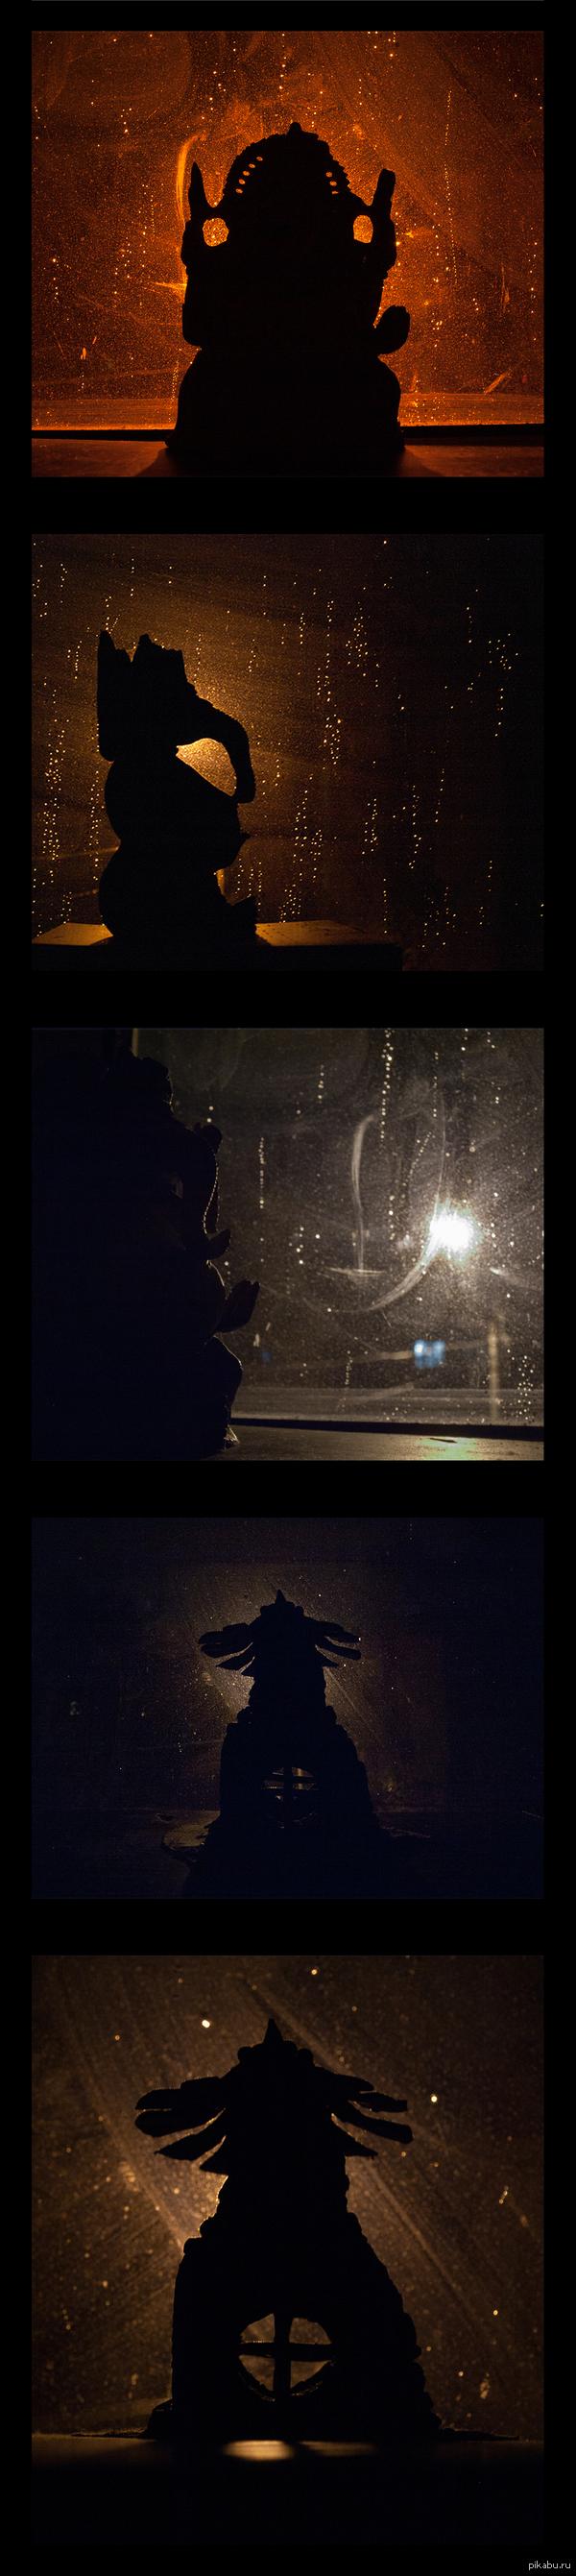 а за окном знакомый силуэт